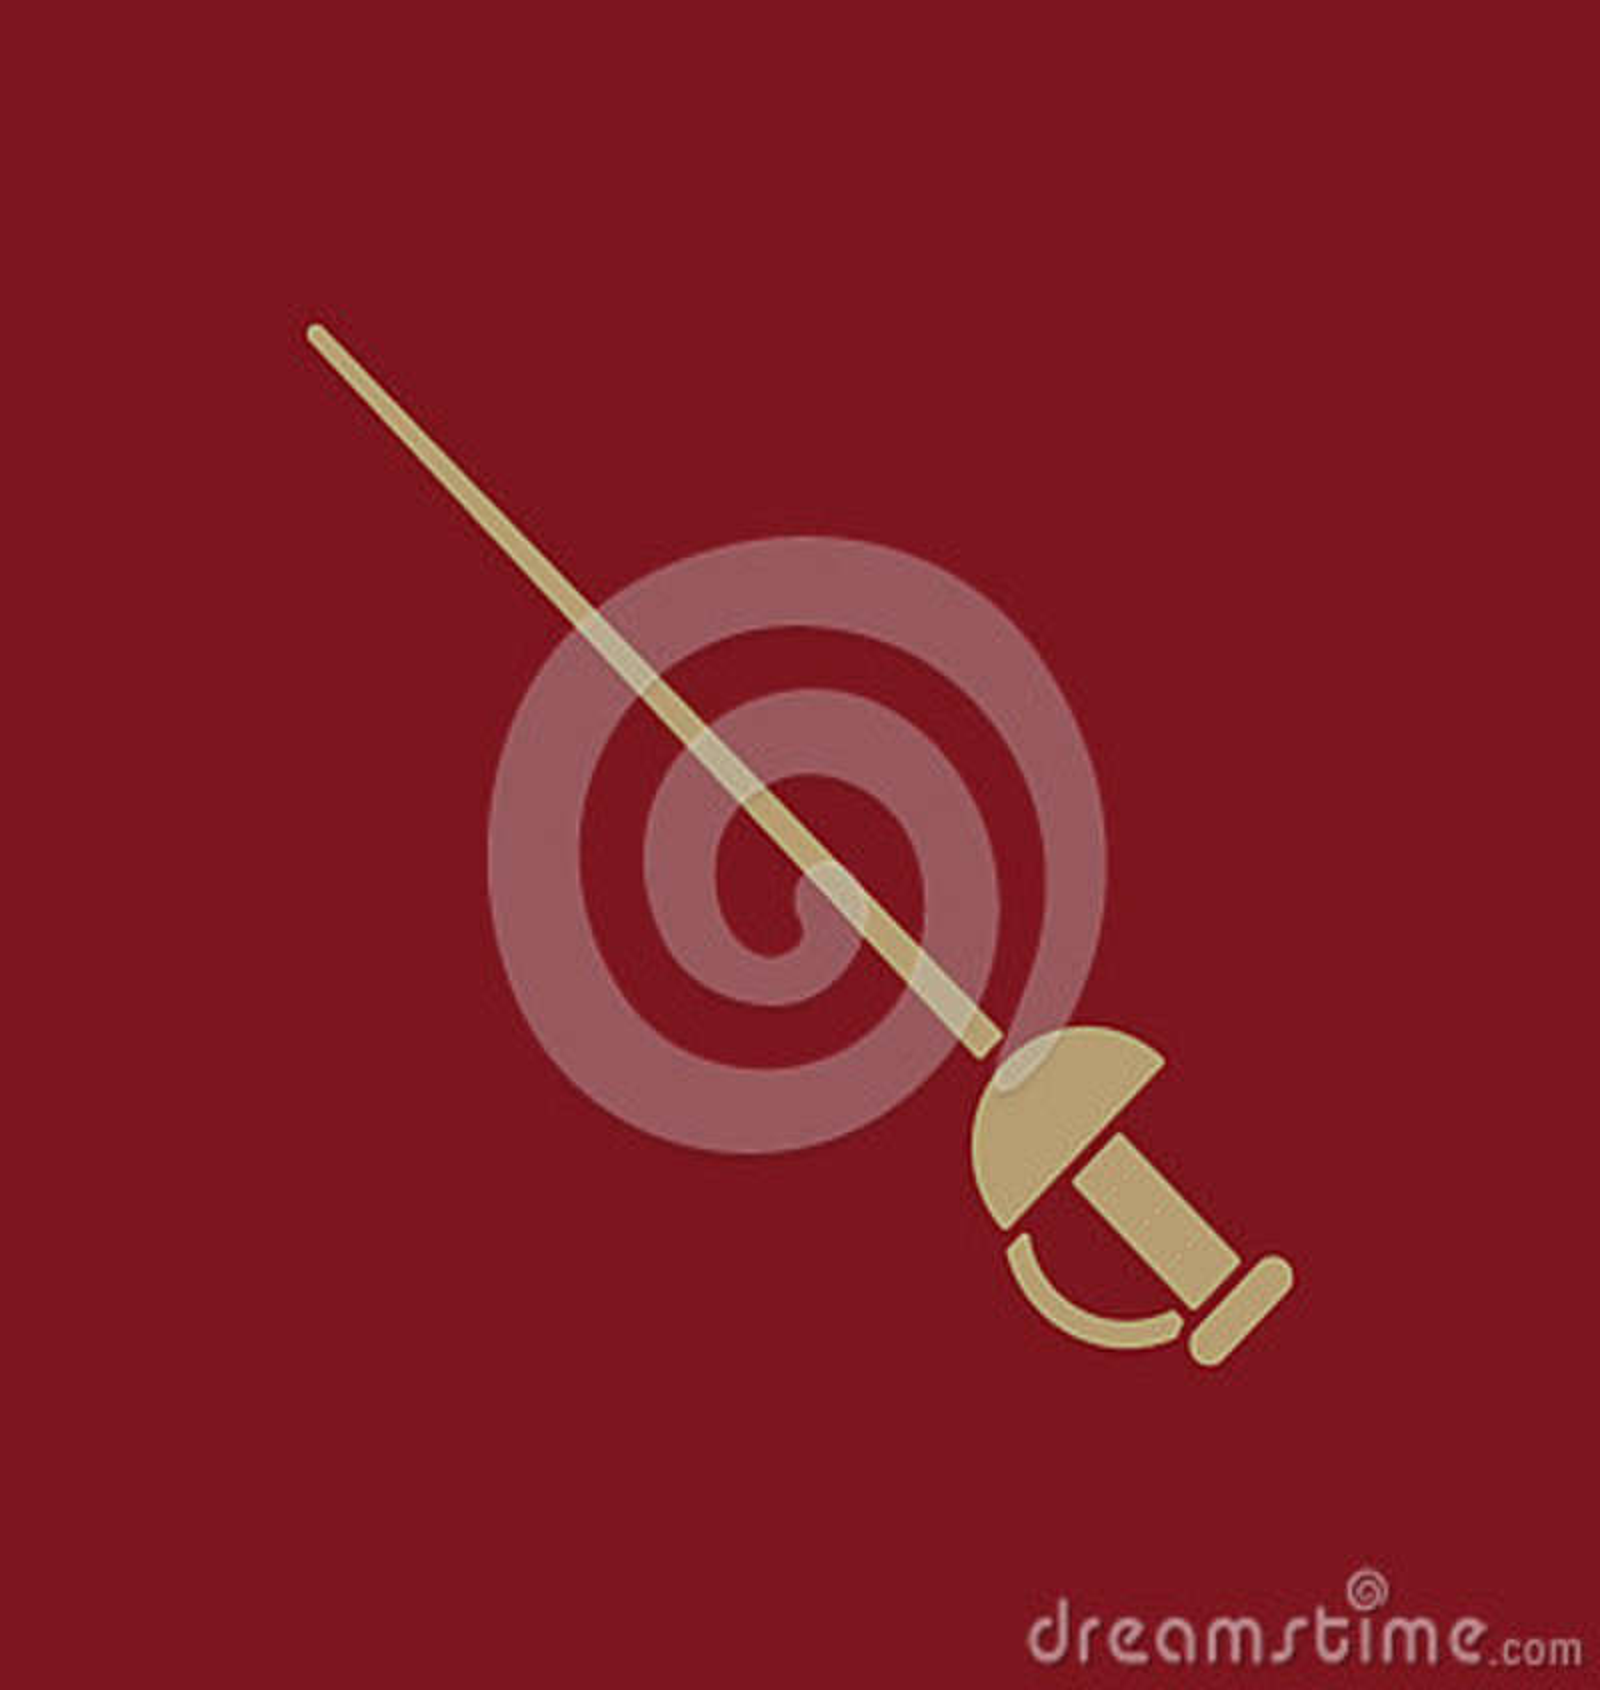 El icono de la espada Símbolo de la espada plano